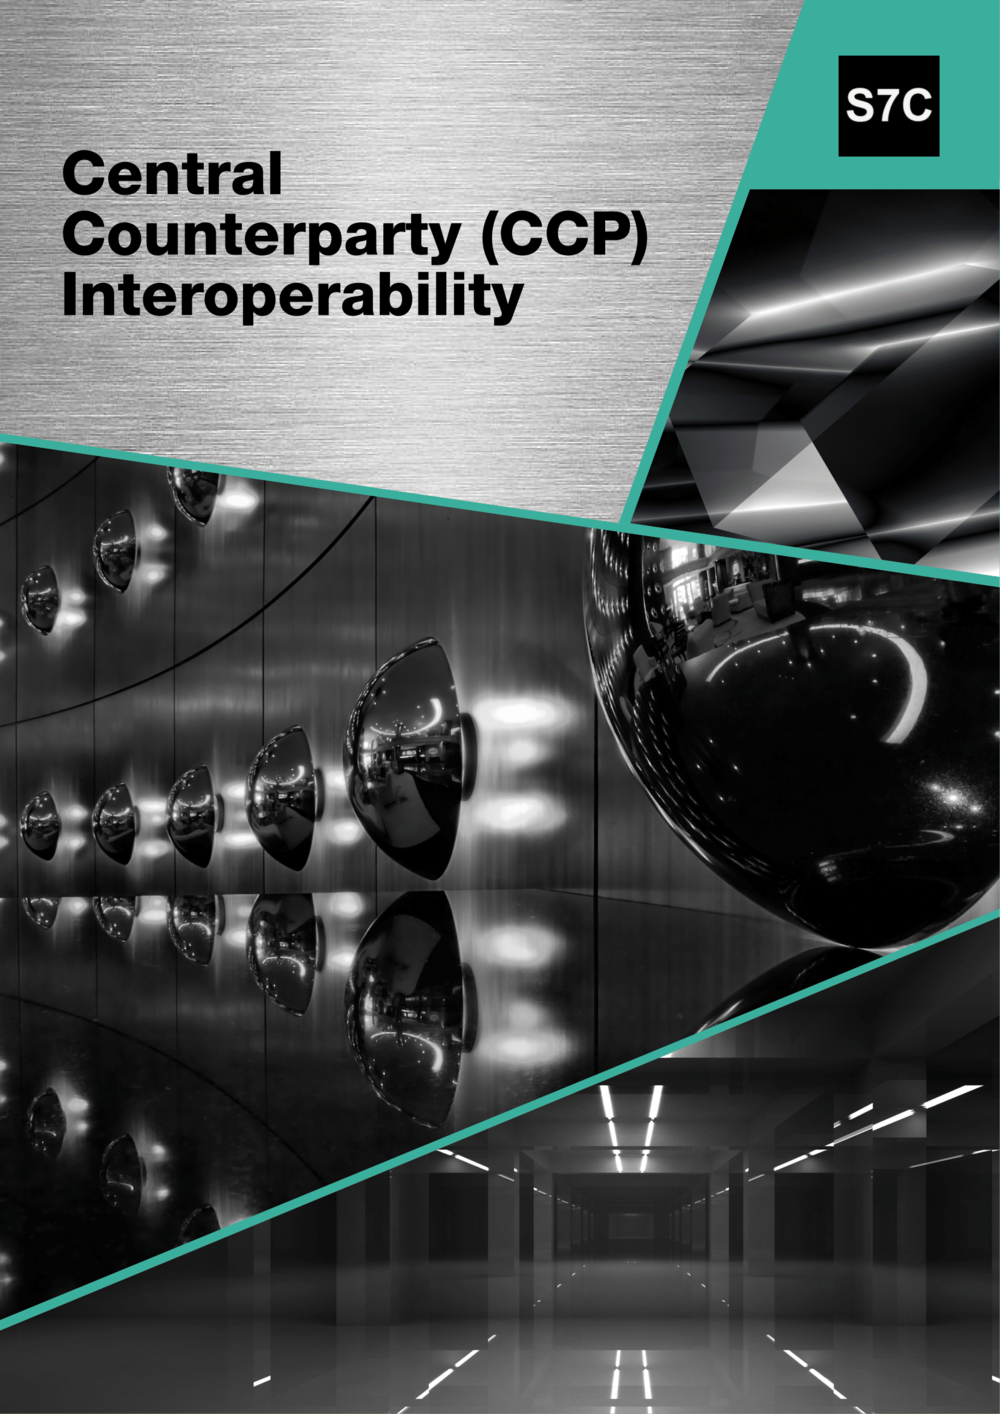 S7C_-_CCP_Interoperability_Updated-1.png